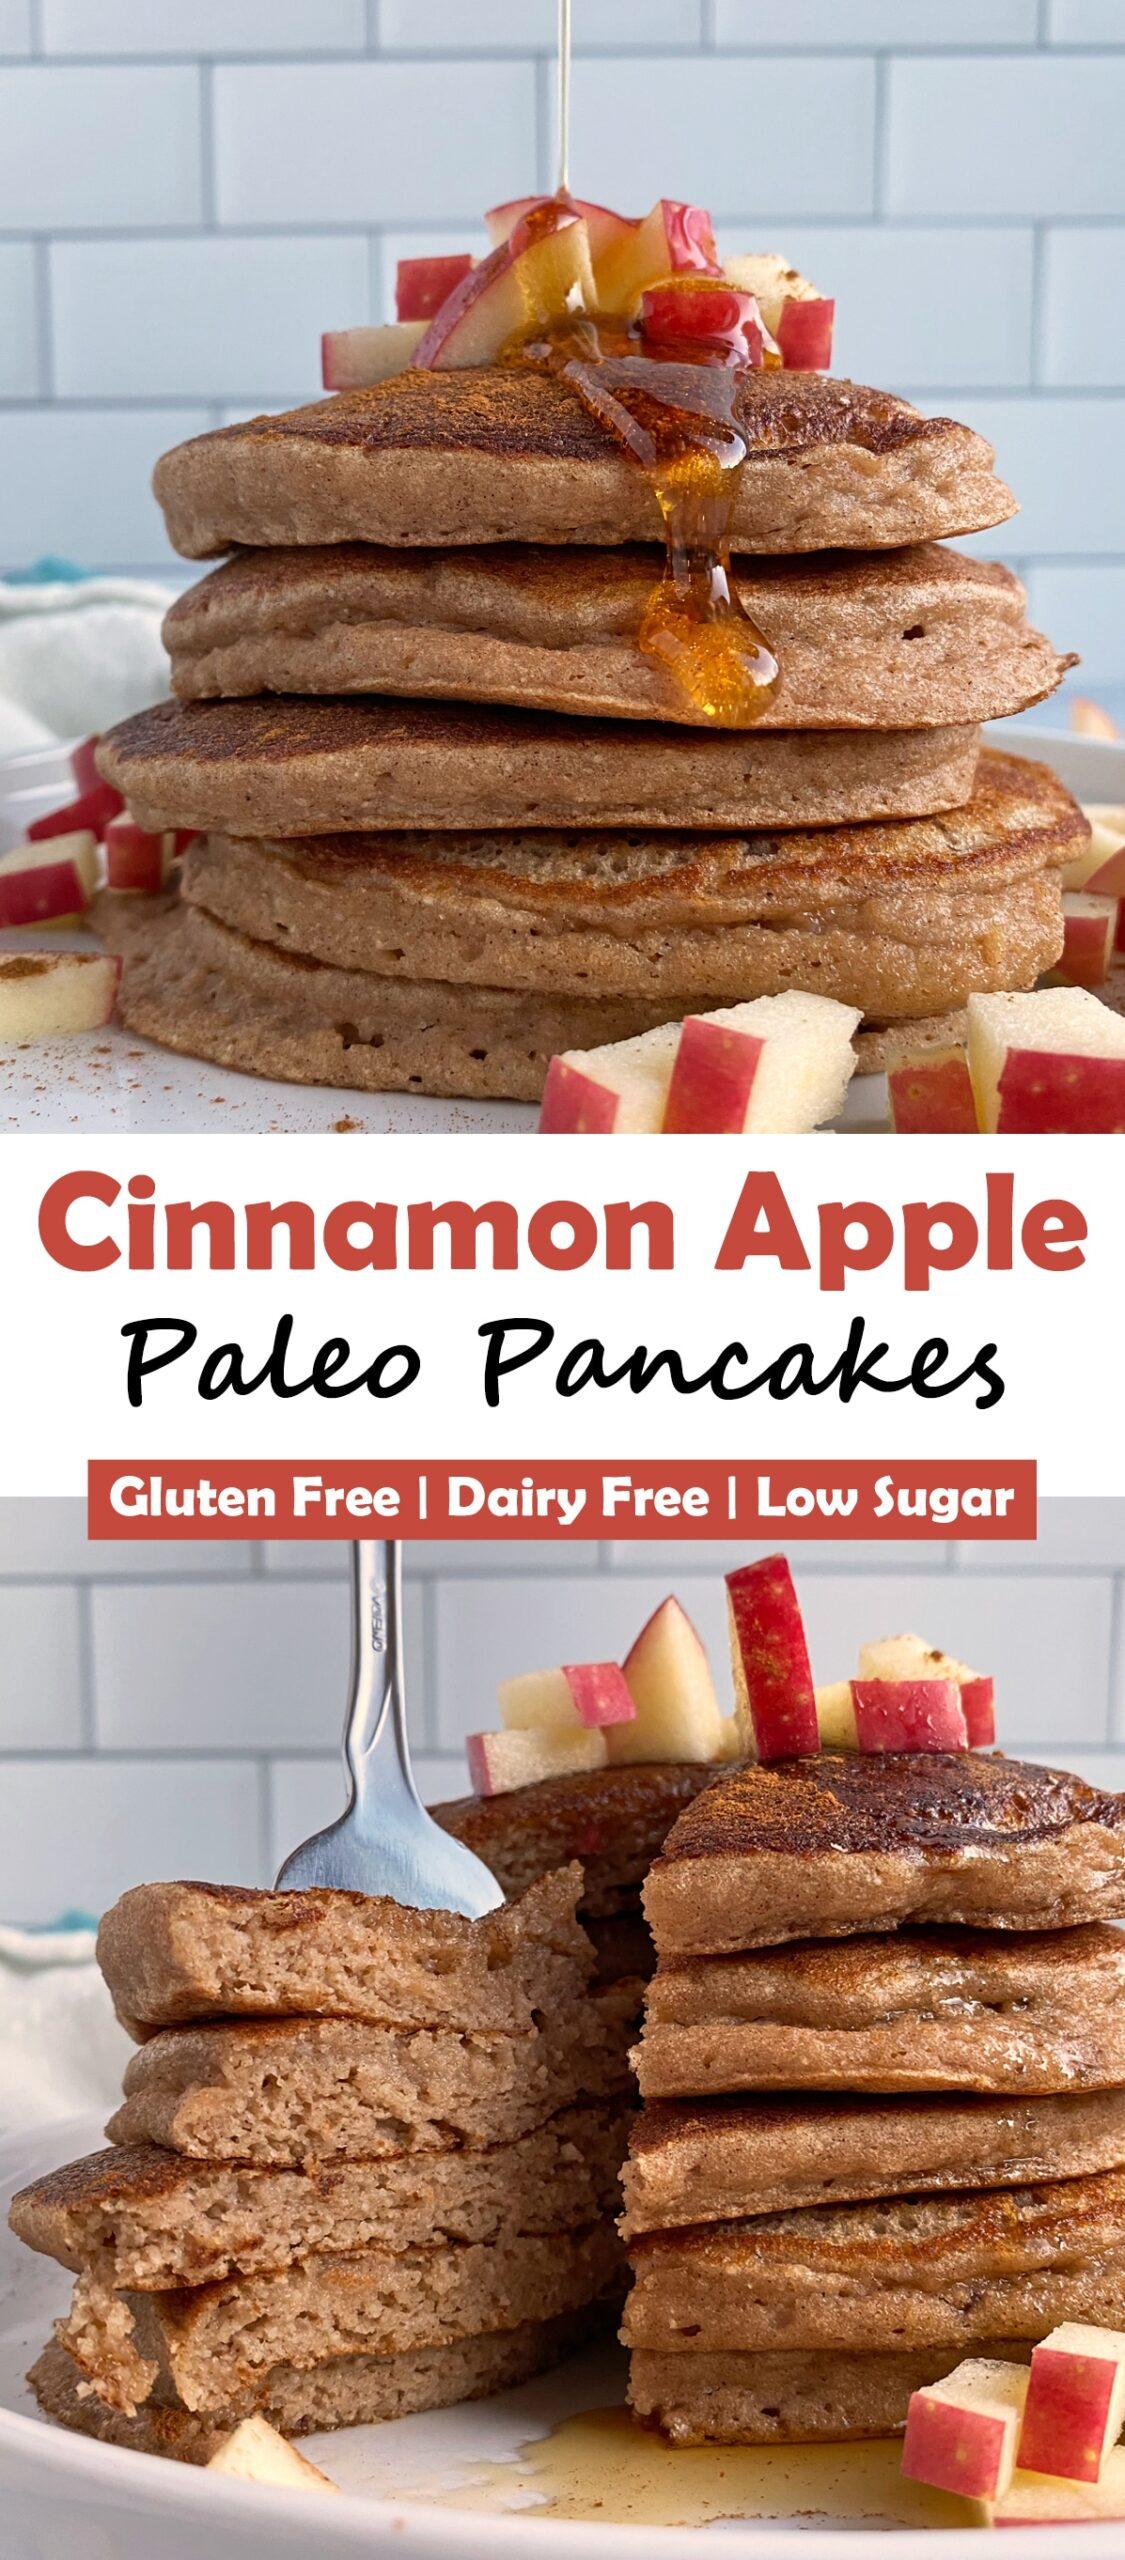 Cinnamon-Apple-Paleo-Pancake-Recipe-pinerest-image